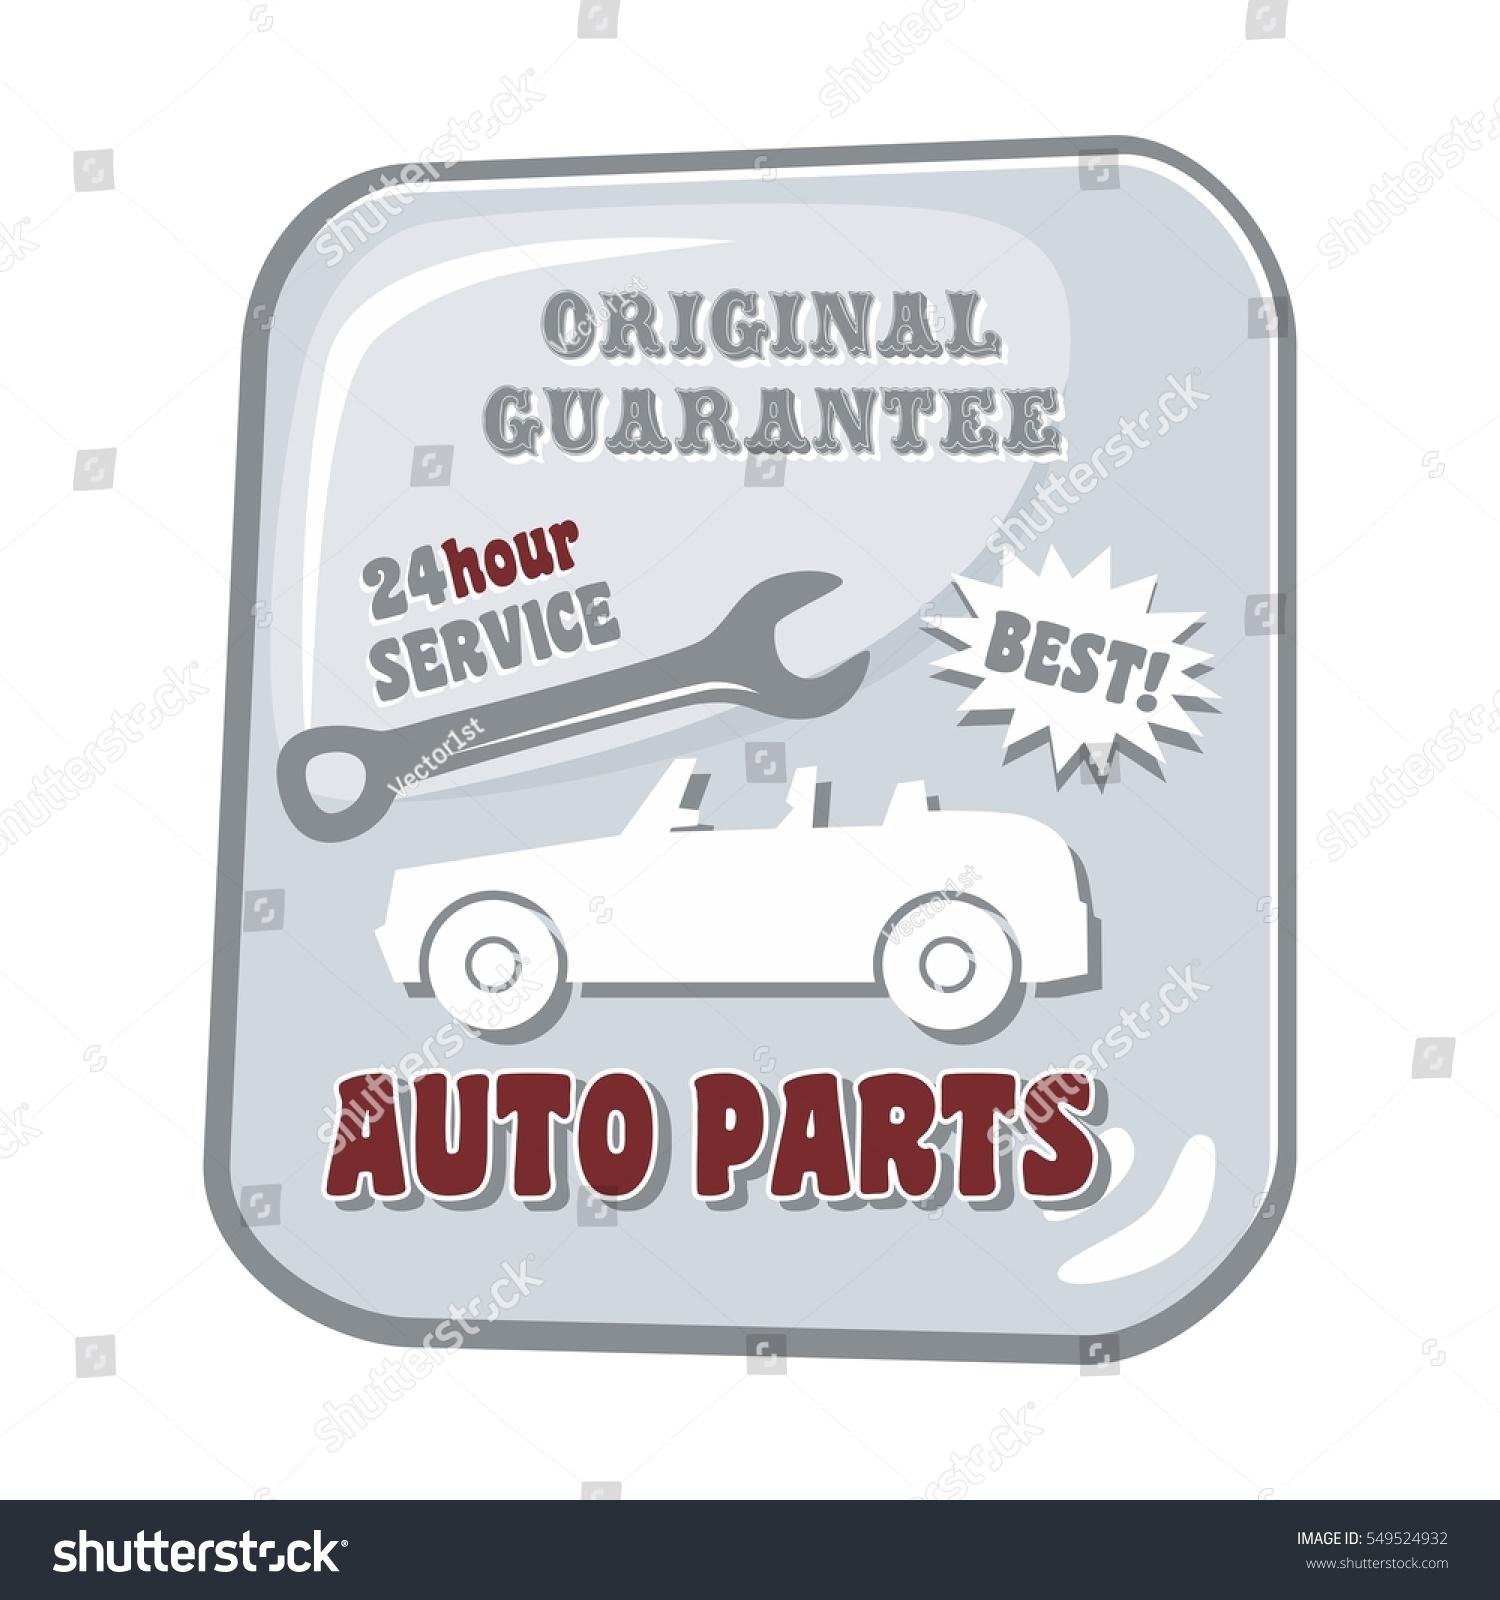 Auto Parts Vehicle Car Transportation Service Stock Illustration ...